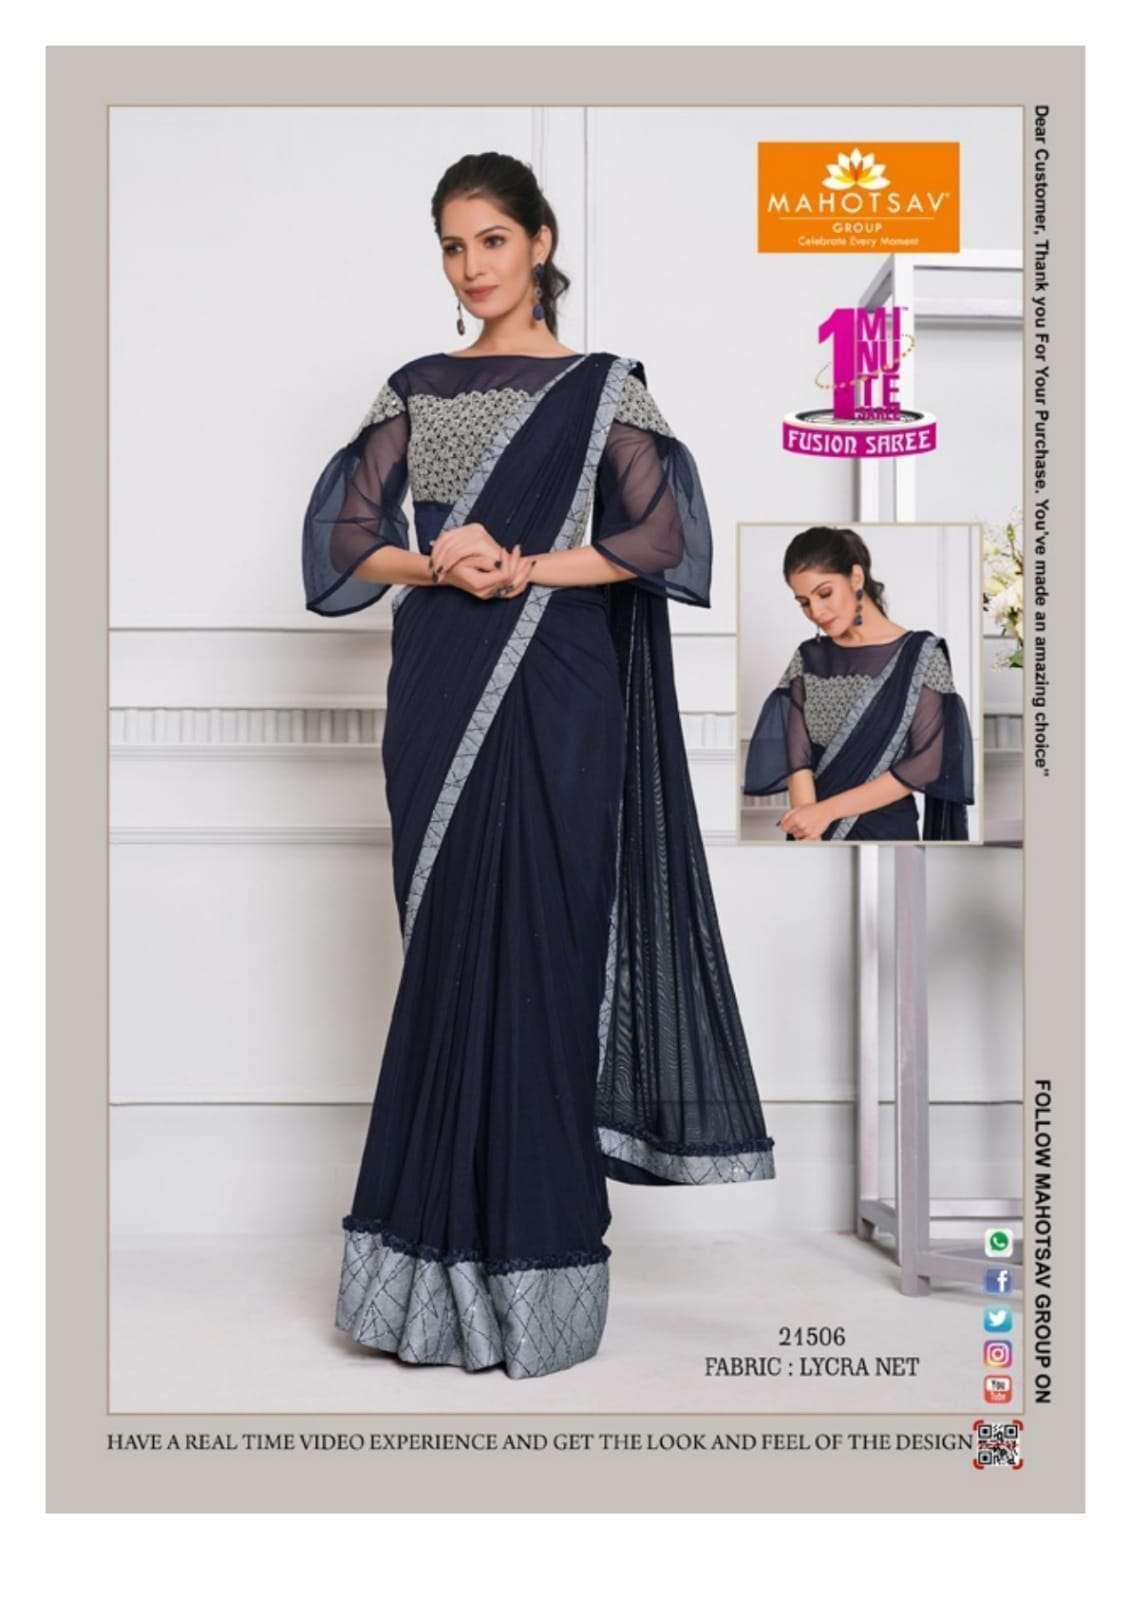 Mahotsav Moh Manthan Izzara 21501 To 215018 Series Fancy Designer Sarees Collection 21506